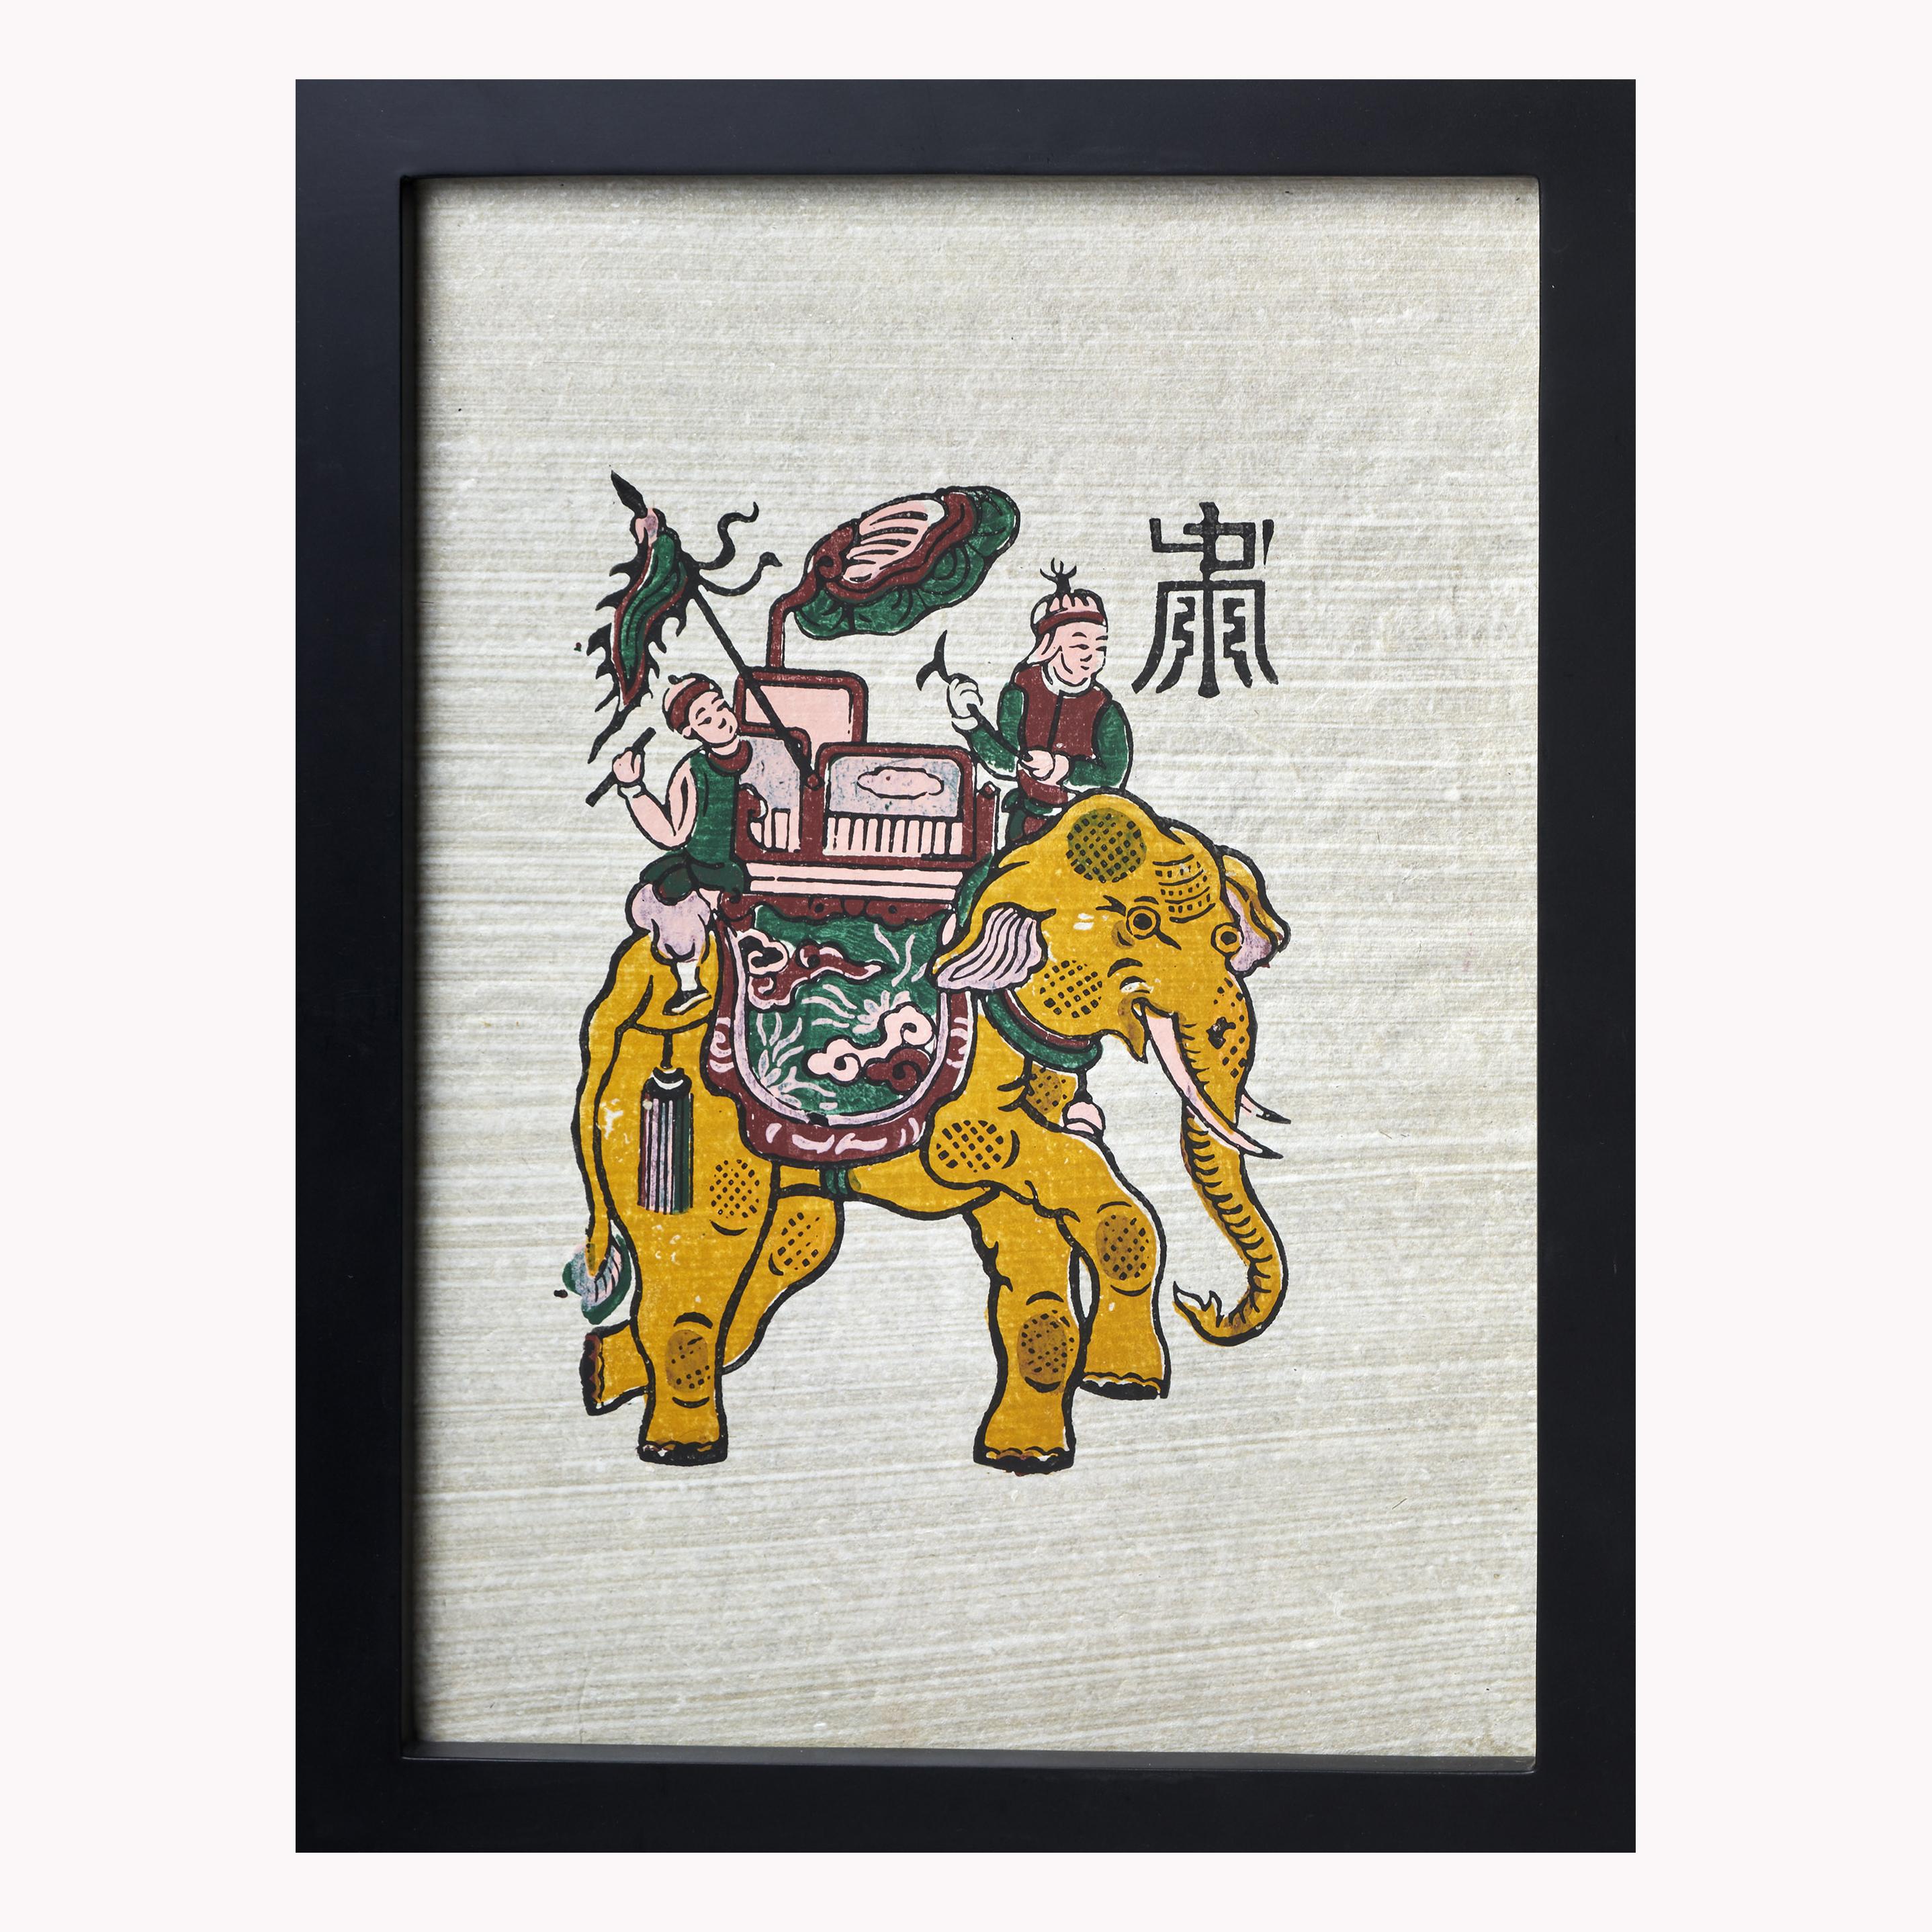 Grabado enmarcado Elefante fondo crudo